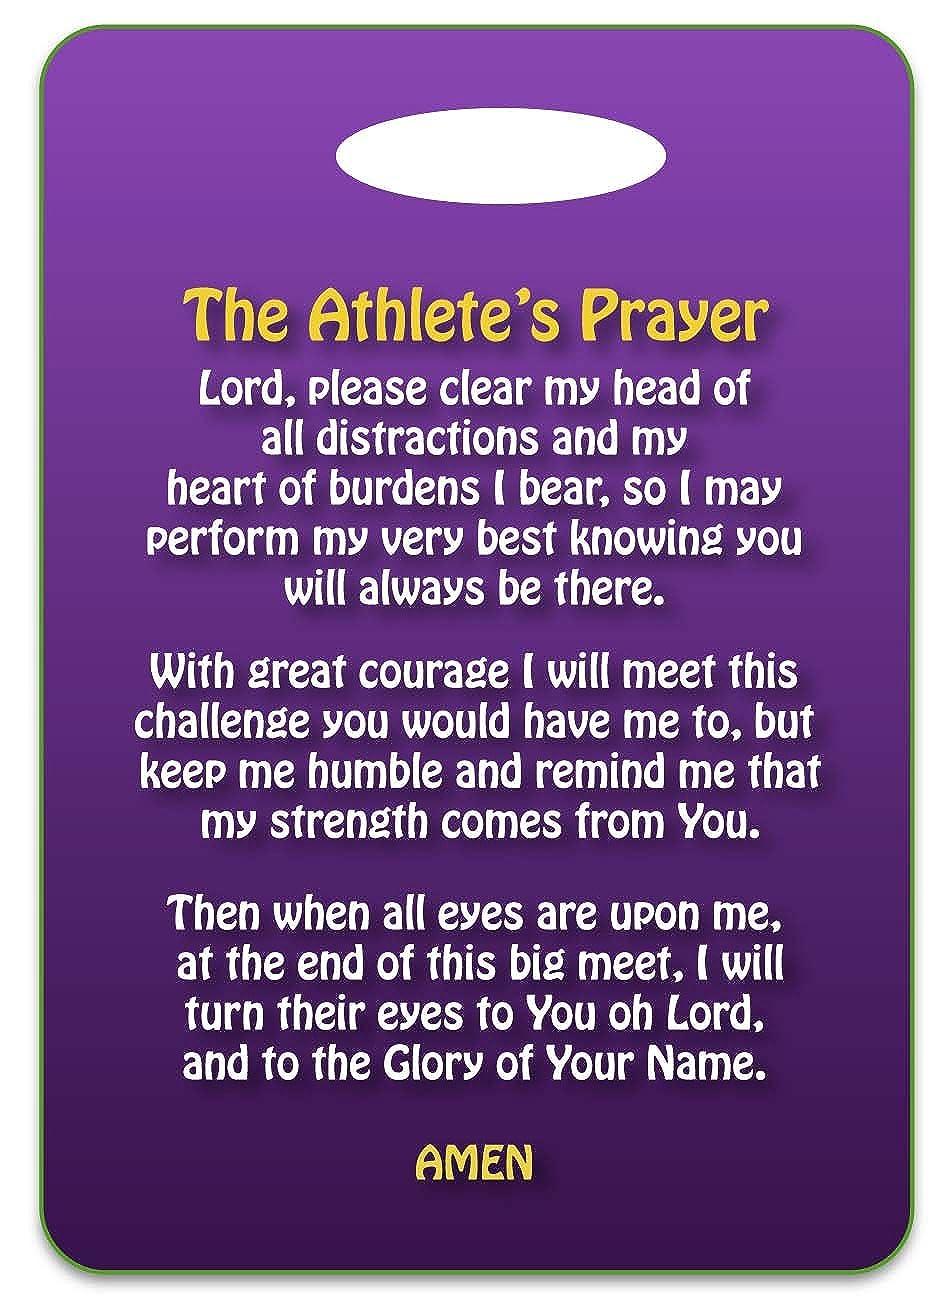 A Prayer選手水泳Swimバッグタグ、スポーツバッグタグ、Swimチームバッグタグ、SwimパーティーFavor InspirationalギフトPersonalized 2.75\ パープル B01NBT3PHS